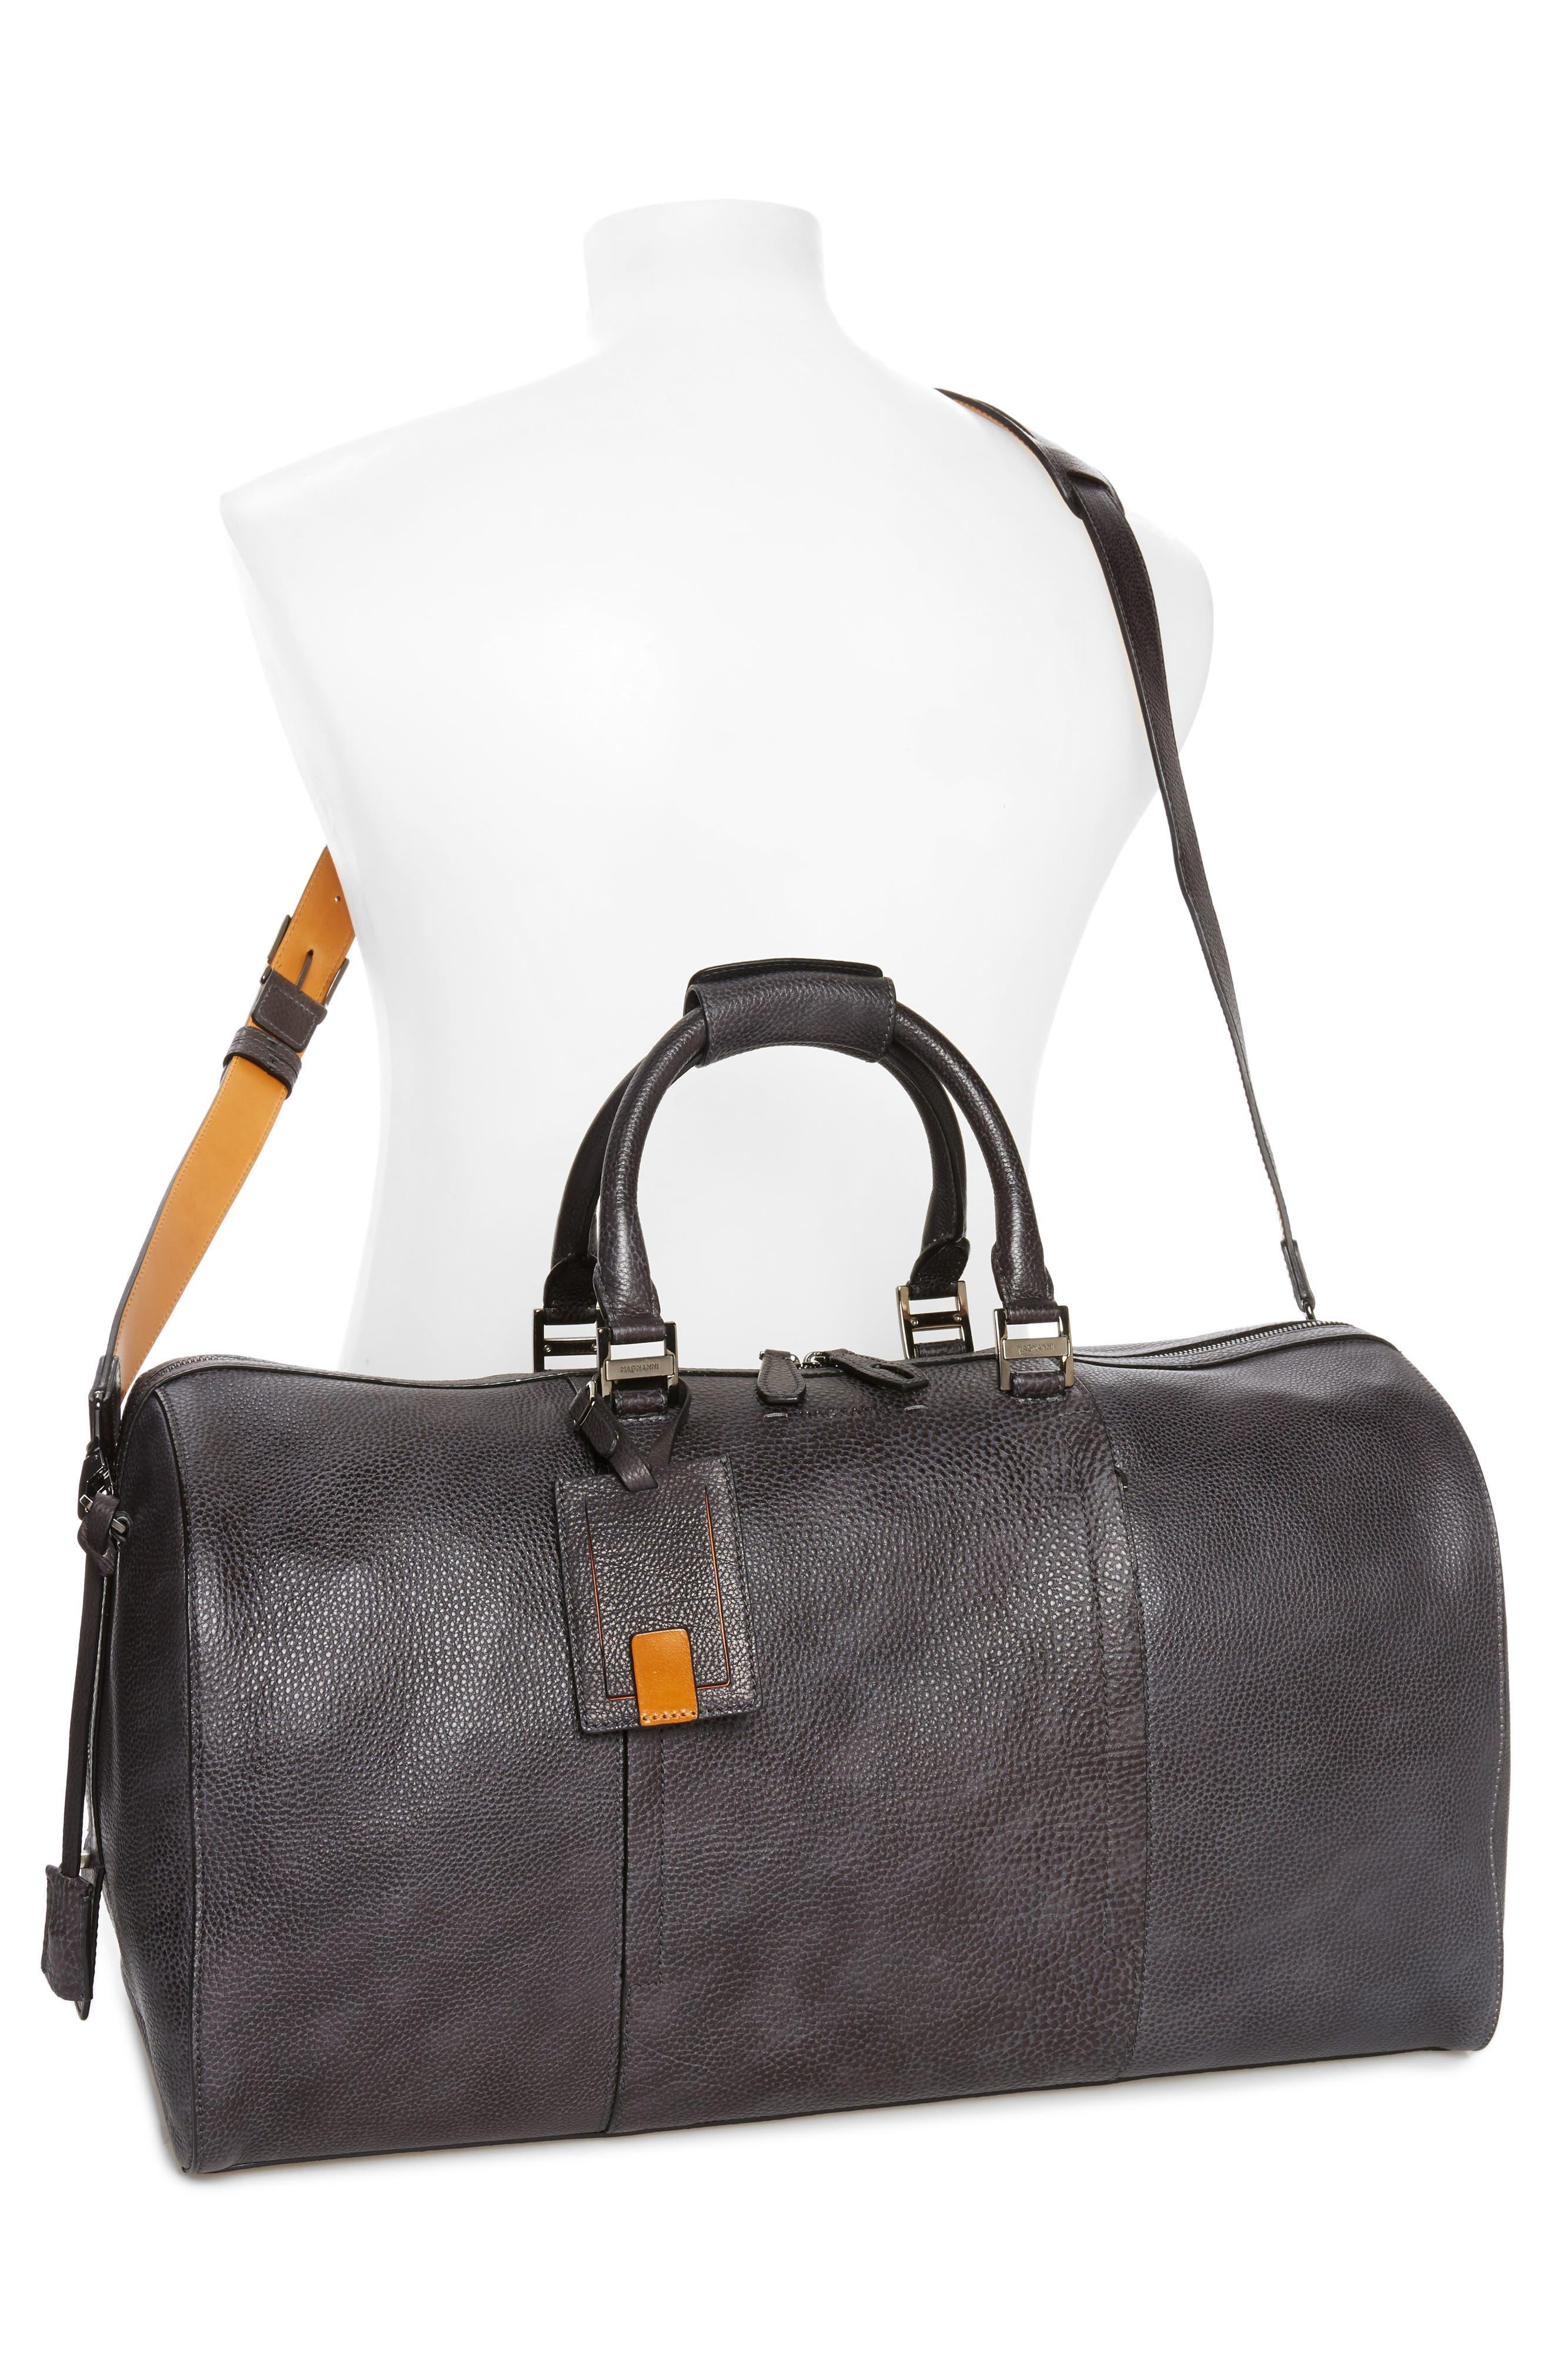 Traveler Leather Duffel Bag,                             Alternate thumbnail 2, color,                             020